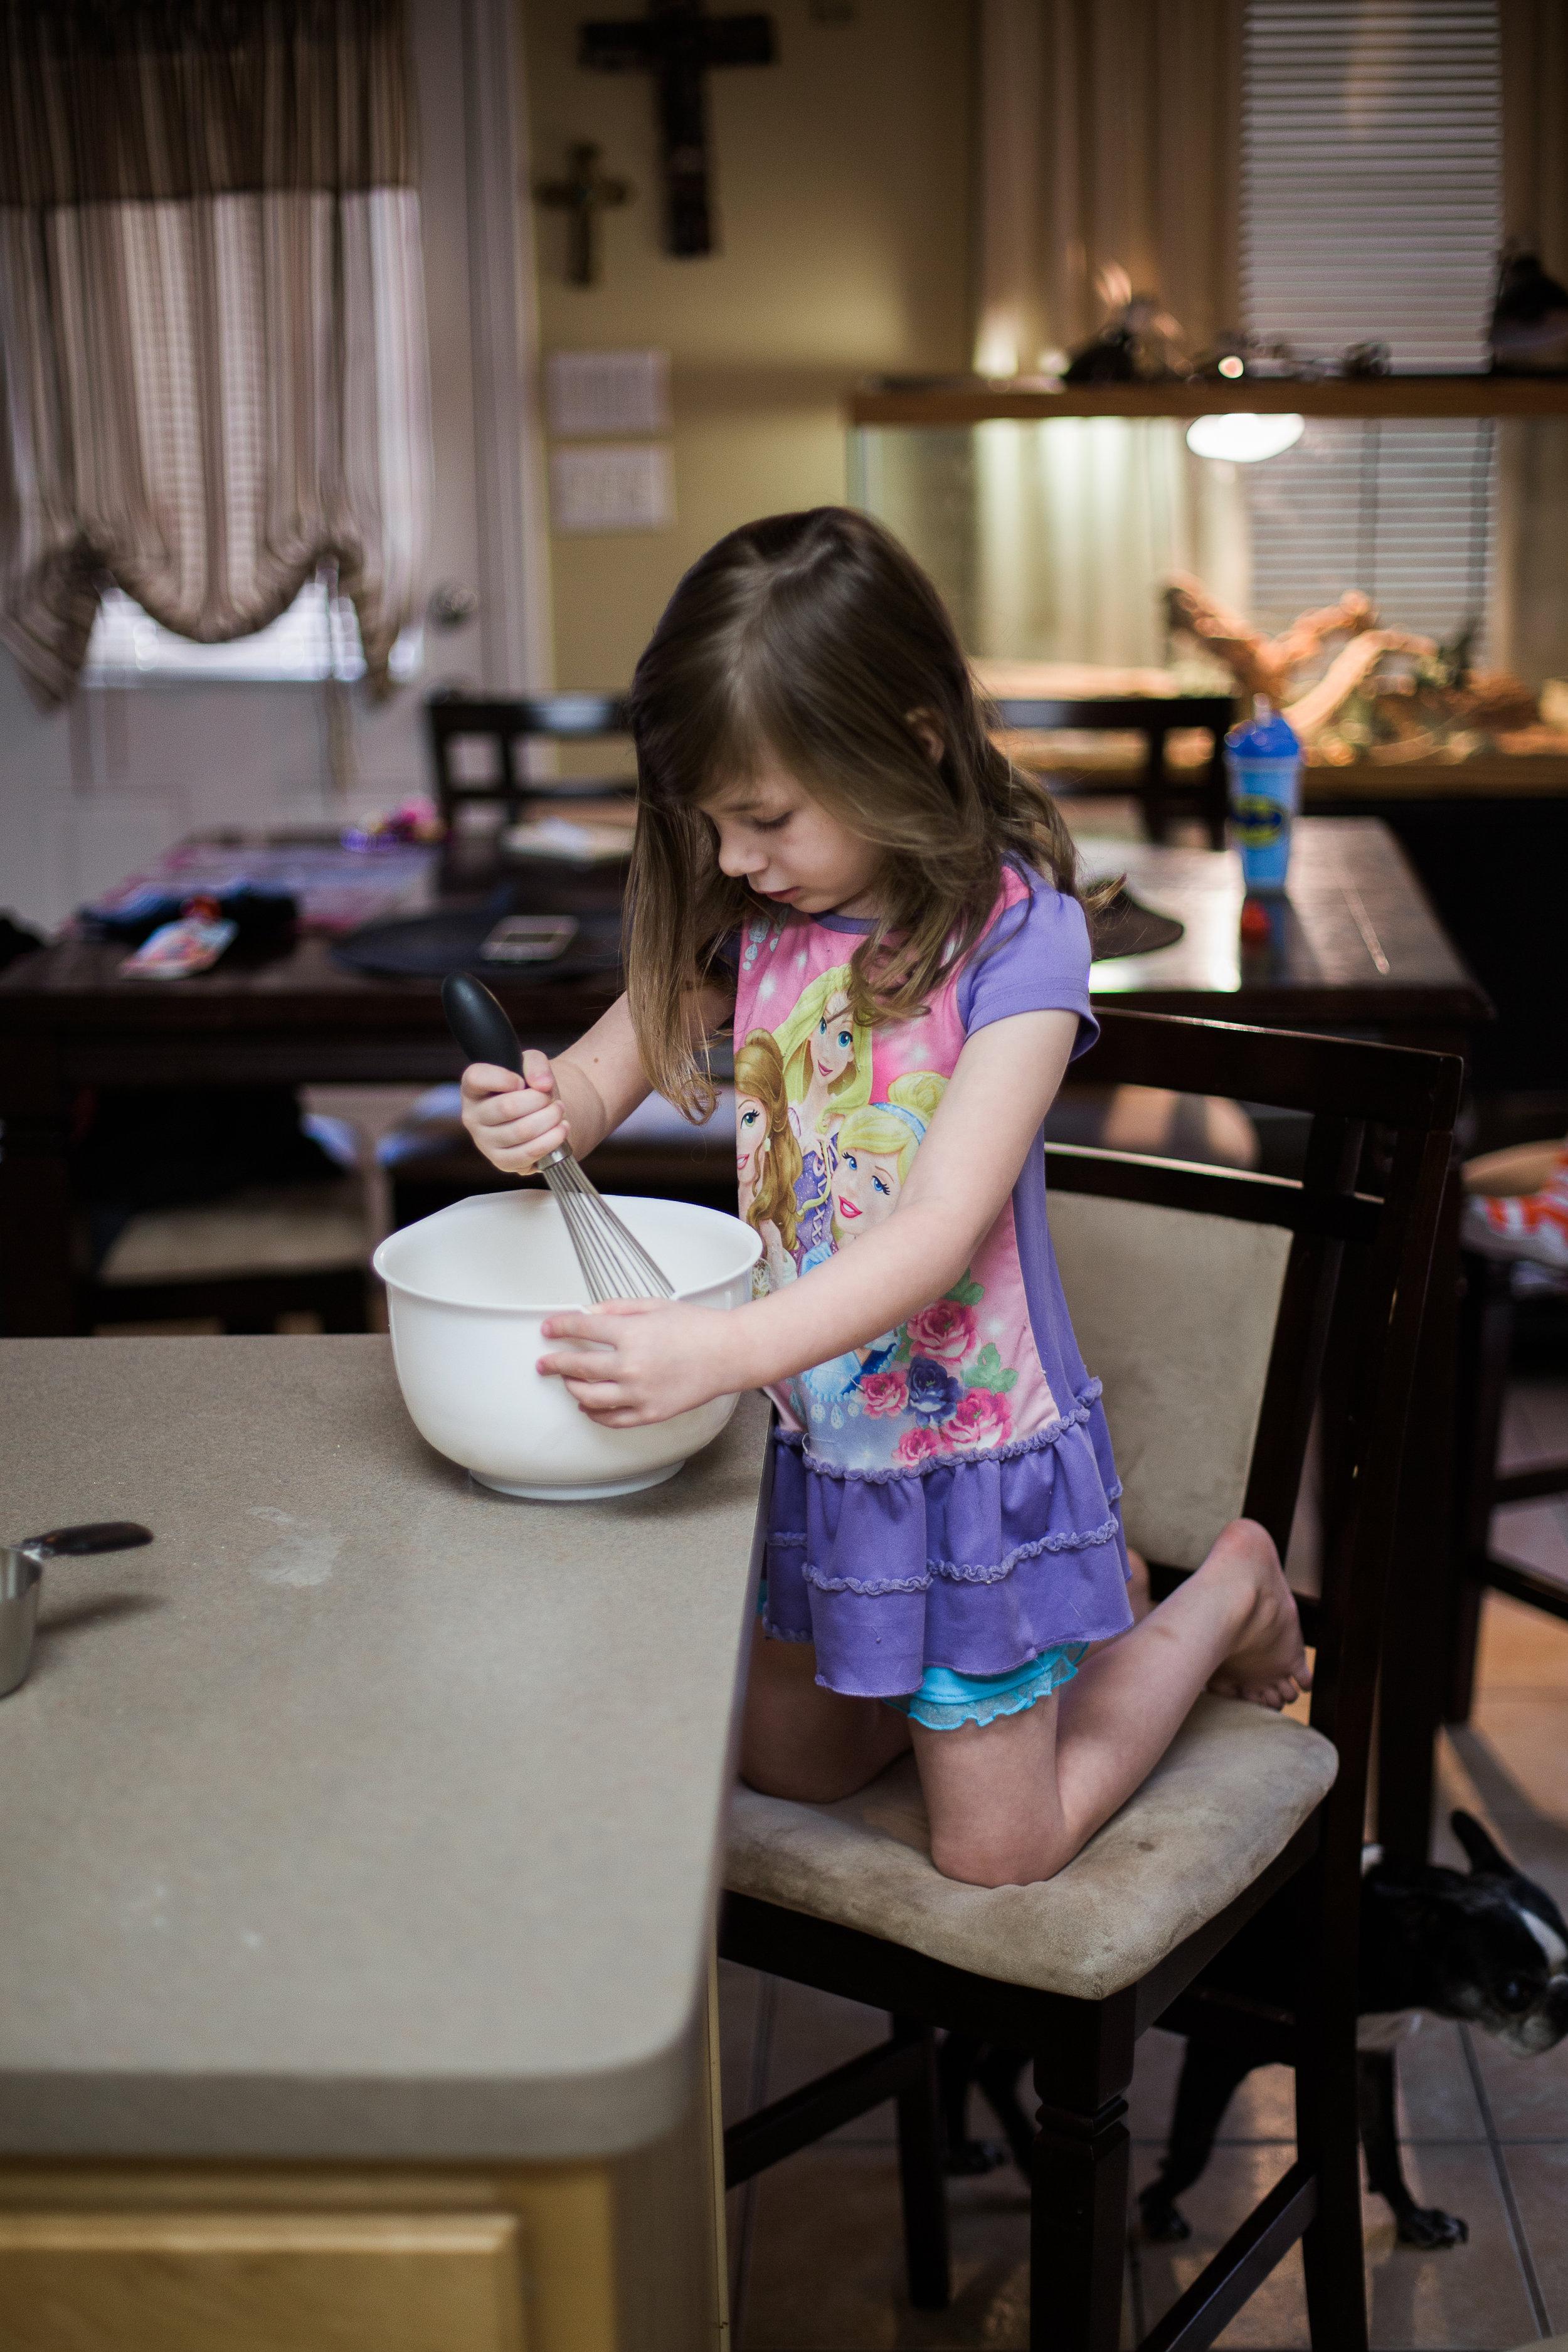 Child Photos | Cypress TX